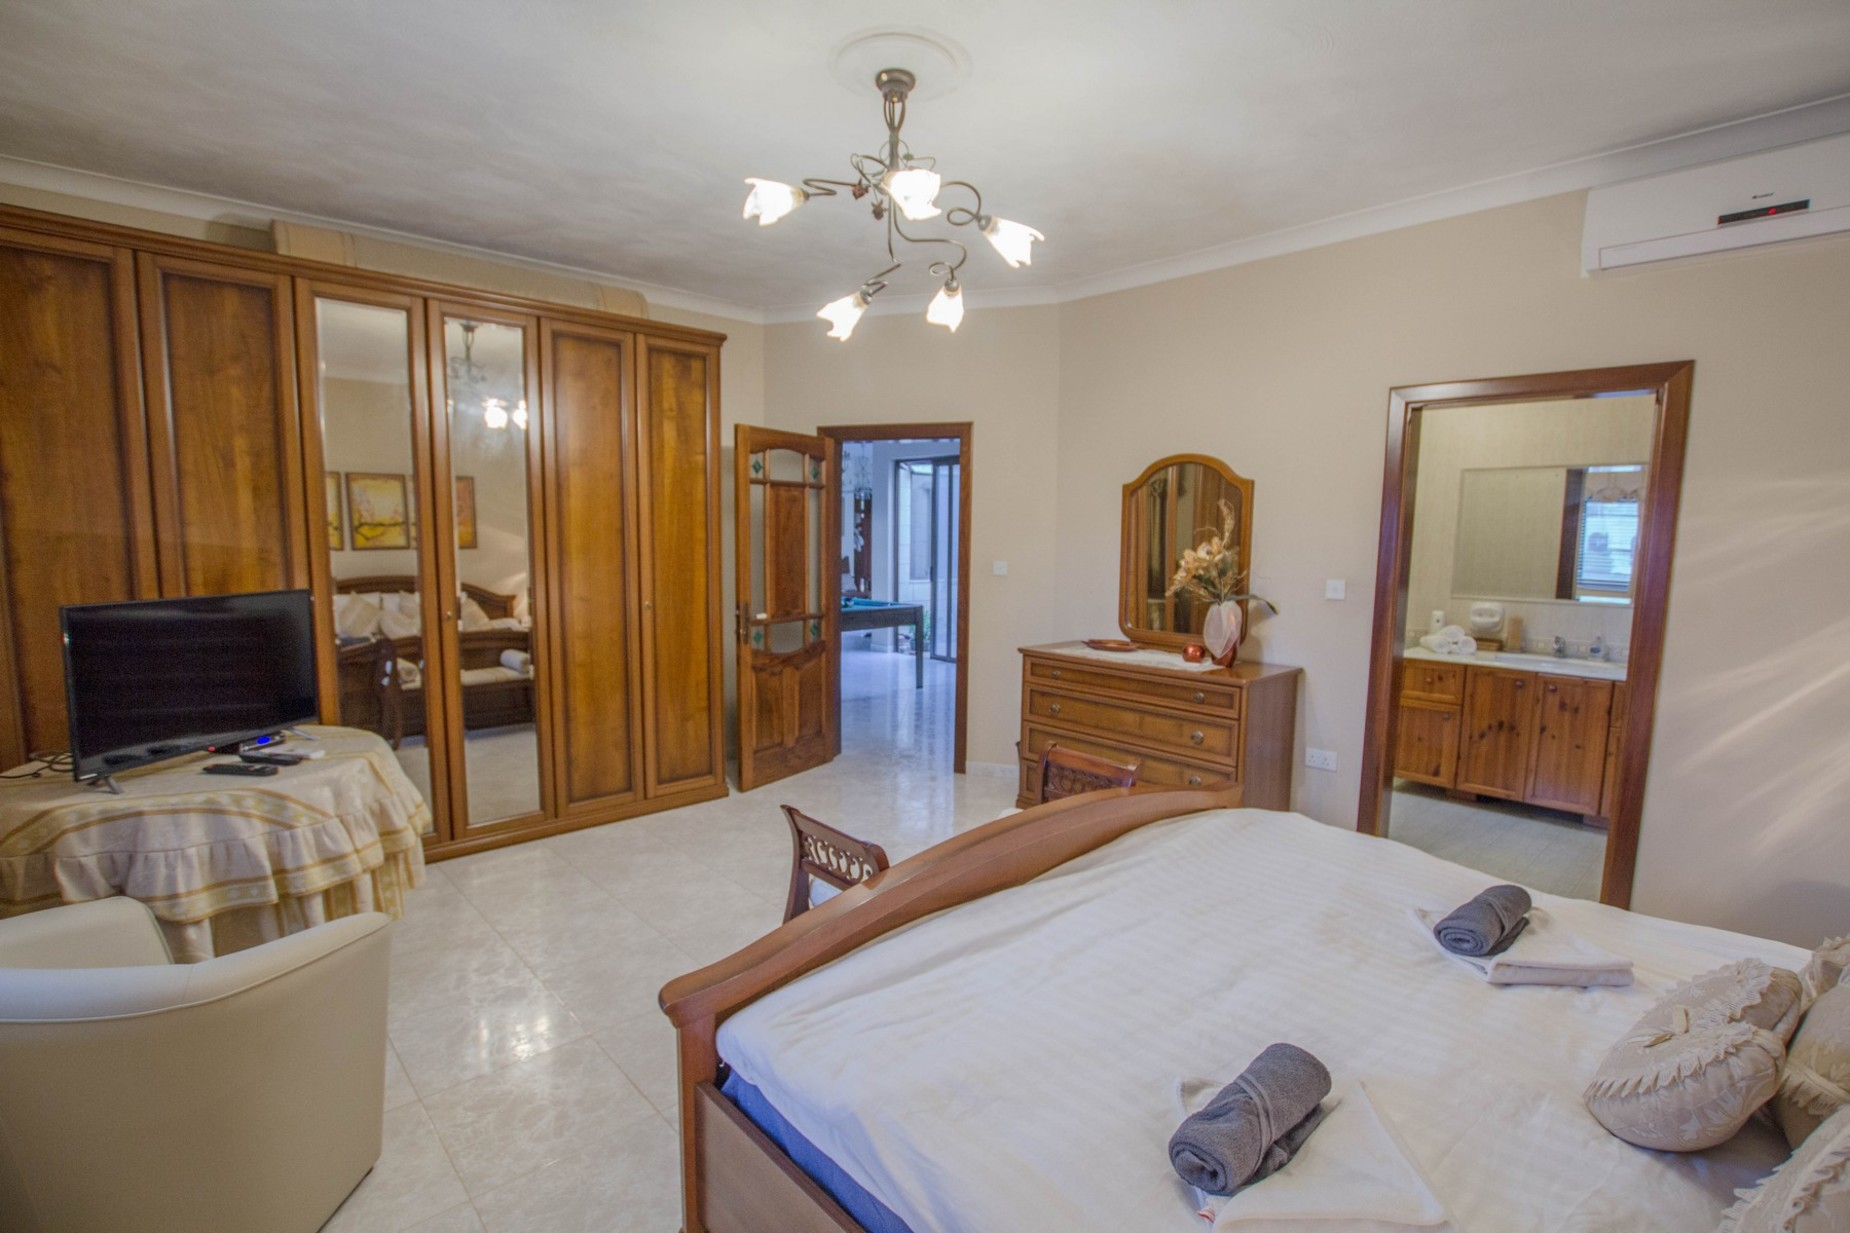 6 bed Villa For Rent in Mellieha, Mellieha - thumb 10